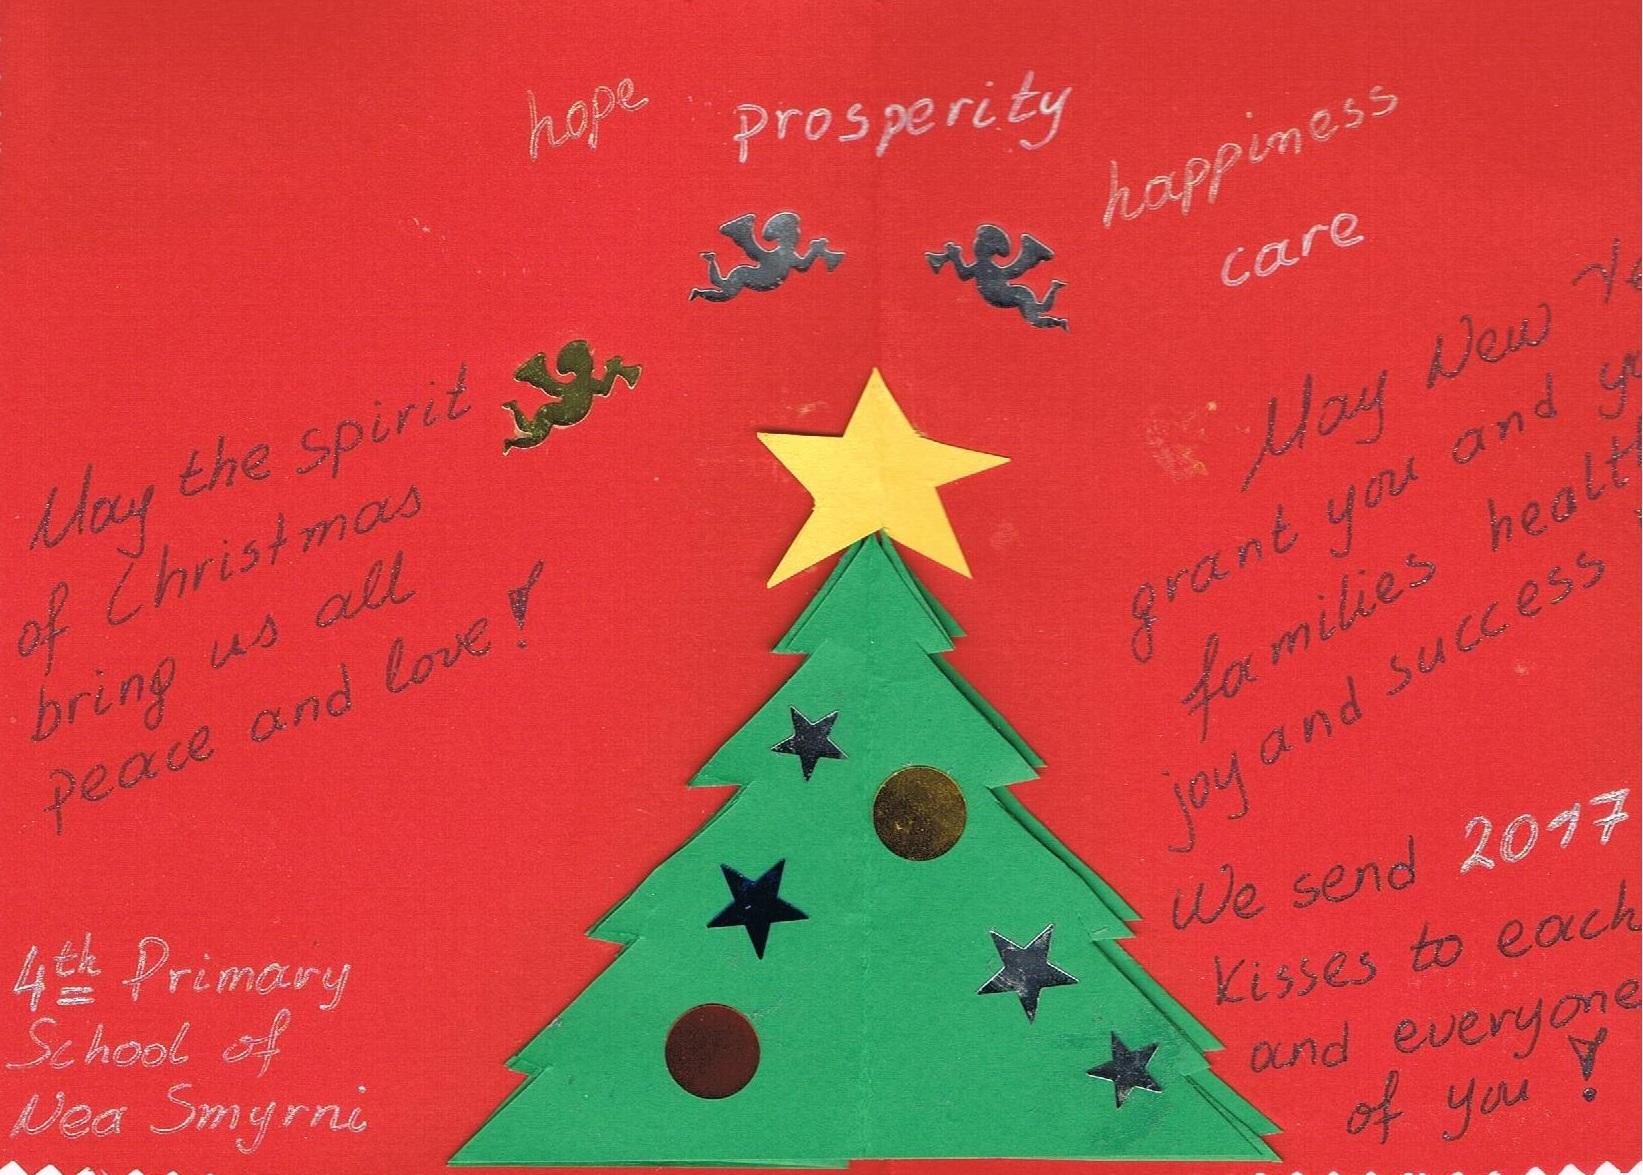 Drawn sykol christmas Erasmus+ The Let's World Save